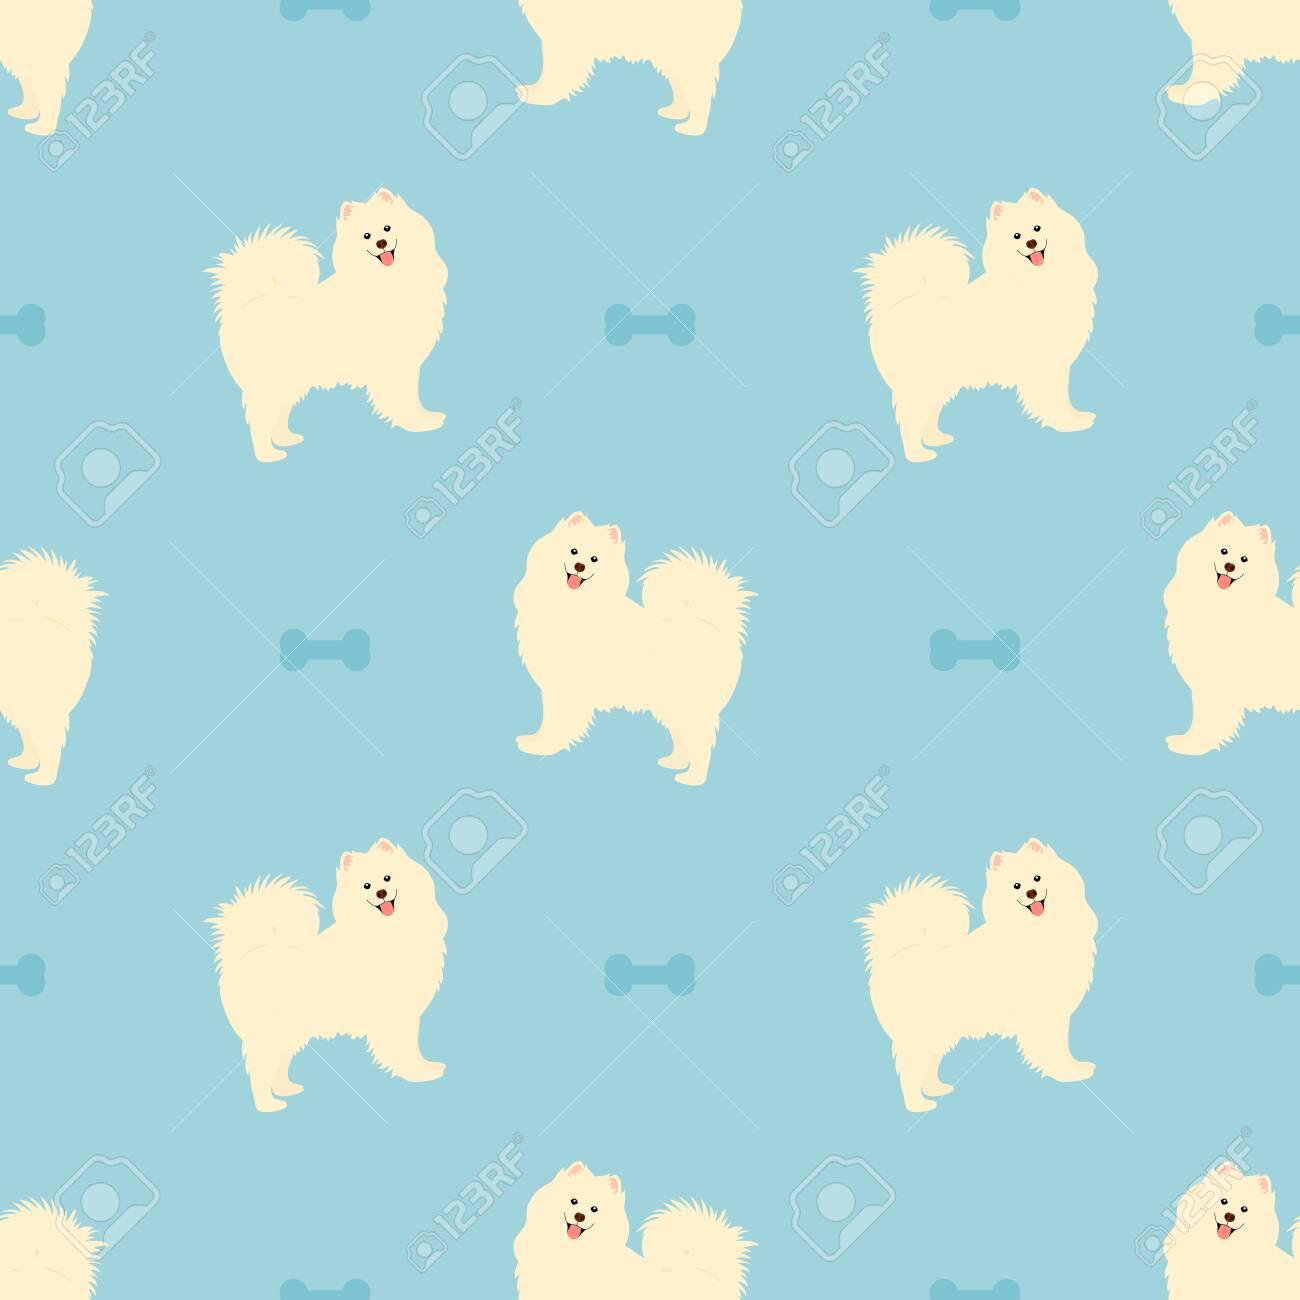 Samoyed Dog Seamless Pattern Background With Dog Bone Cartoon Royalty Free Cliparts Vectors And Stock Illustration Image 149183535